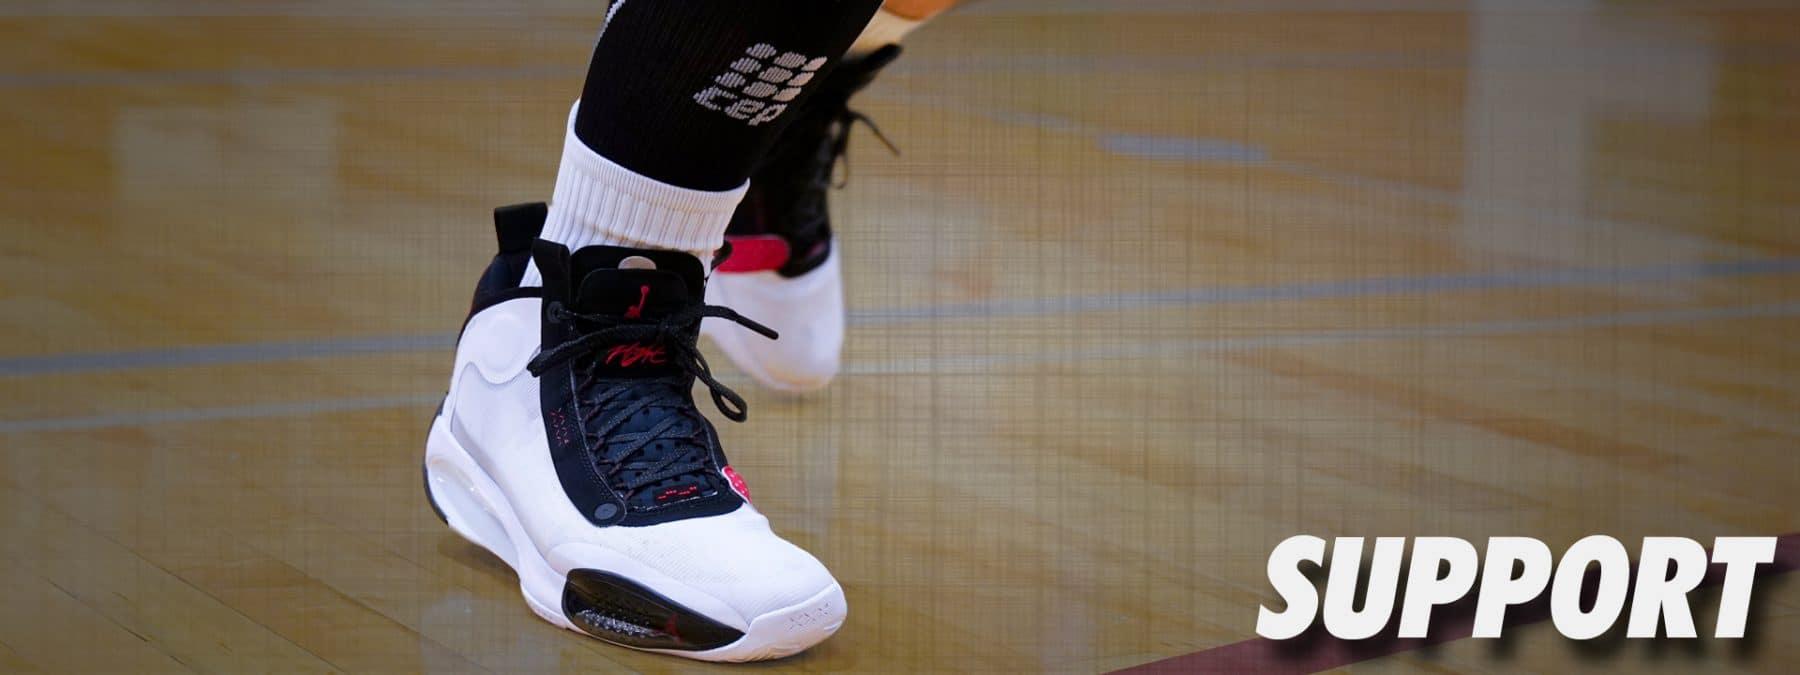 Jordan 34 Support